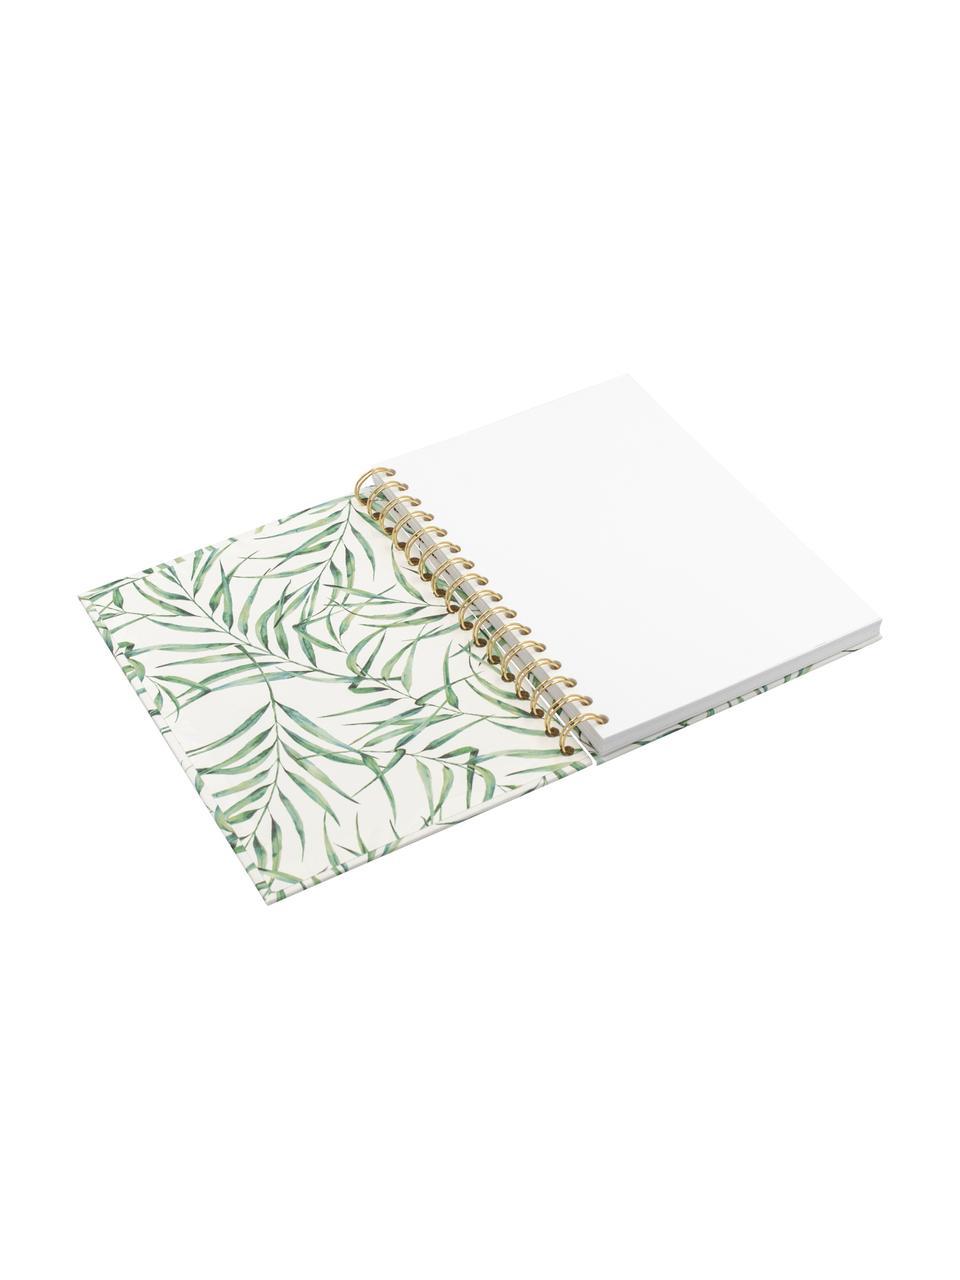 Quaderno a spirale Breeze, Bianco, verde, Larg. 16 x Alt. 21 cm